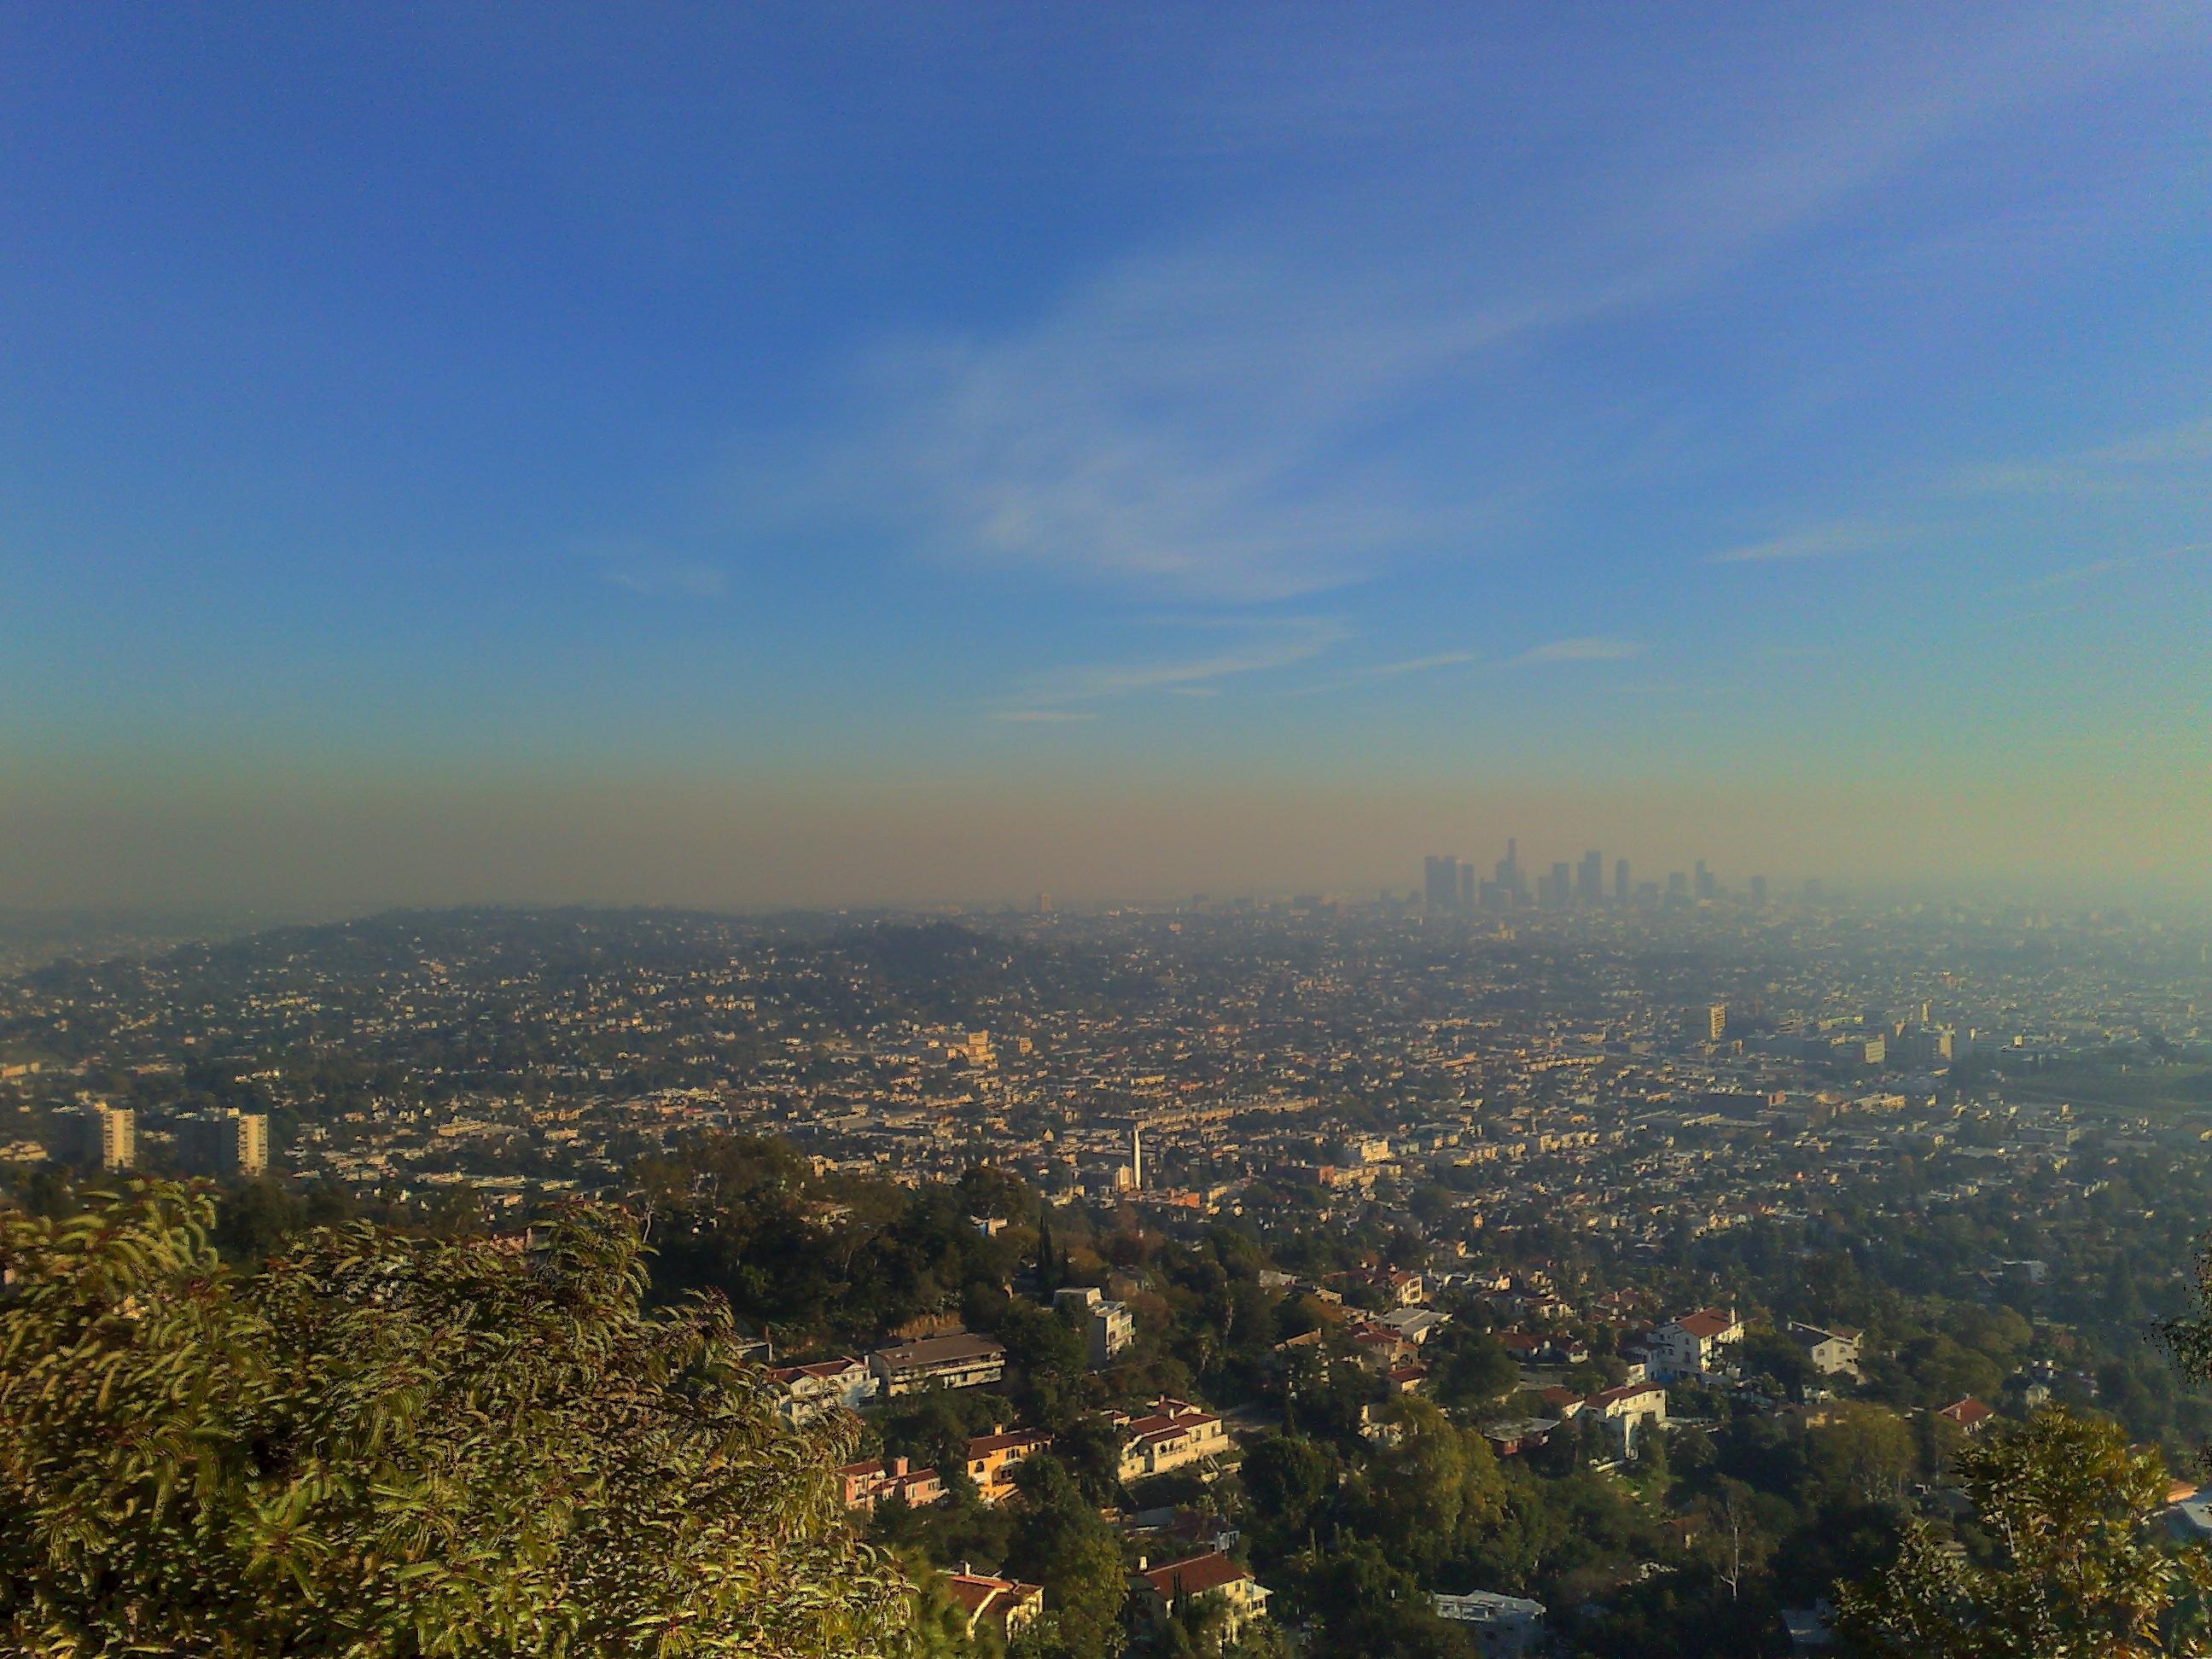 Smog visible as an orange haze over Los Angeles.